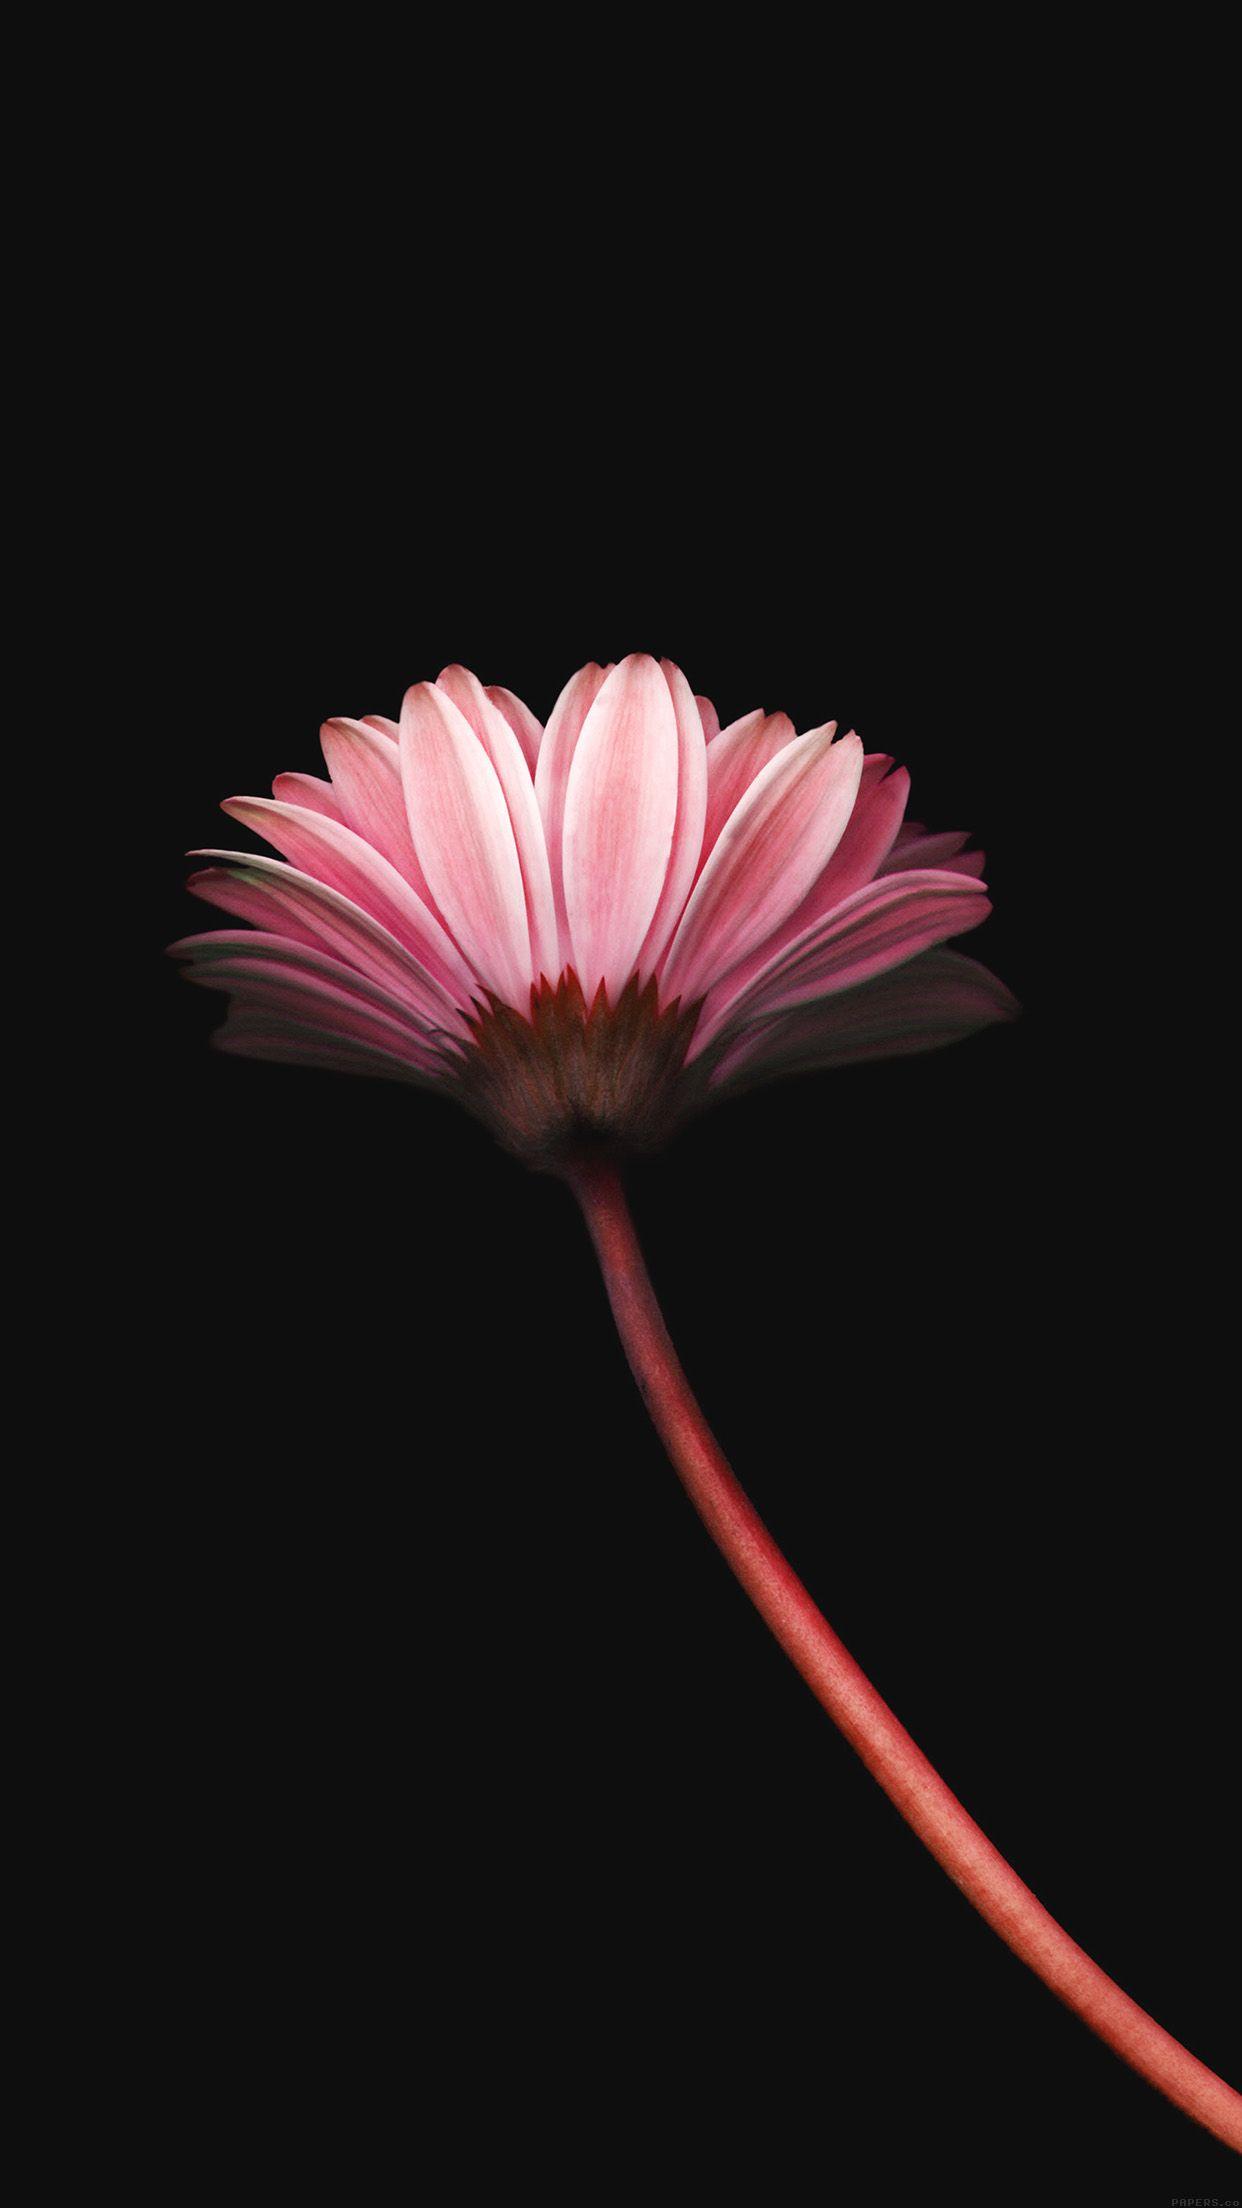 Lonely Flower Dark Red Minimal Iphone 6 Plus Cute Flower Wallpapers Iphone 6 Plus Wallpaper Black Wallpaper Iphone